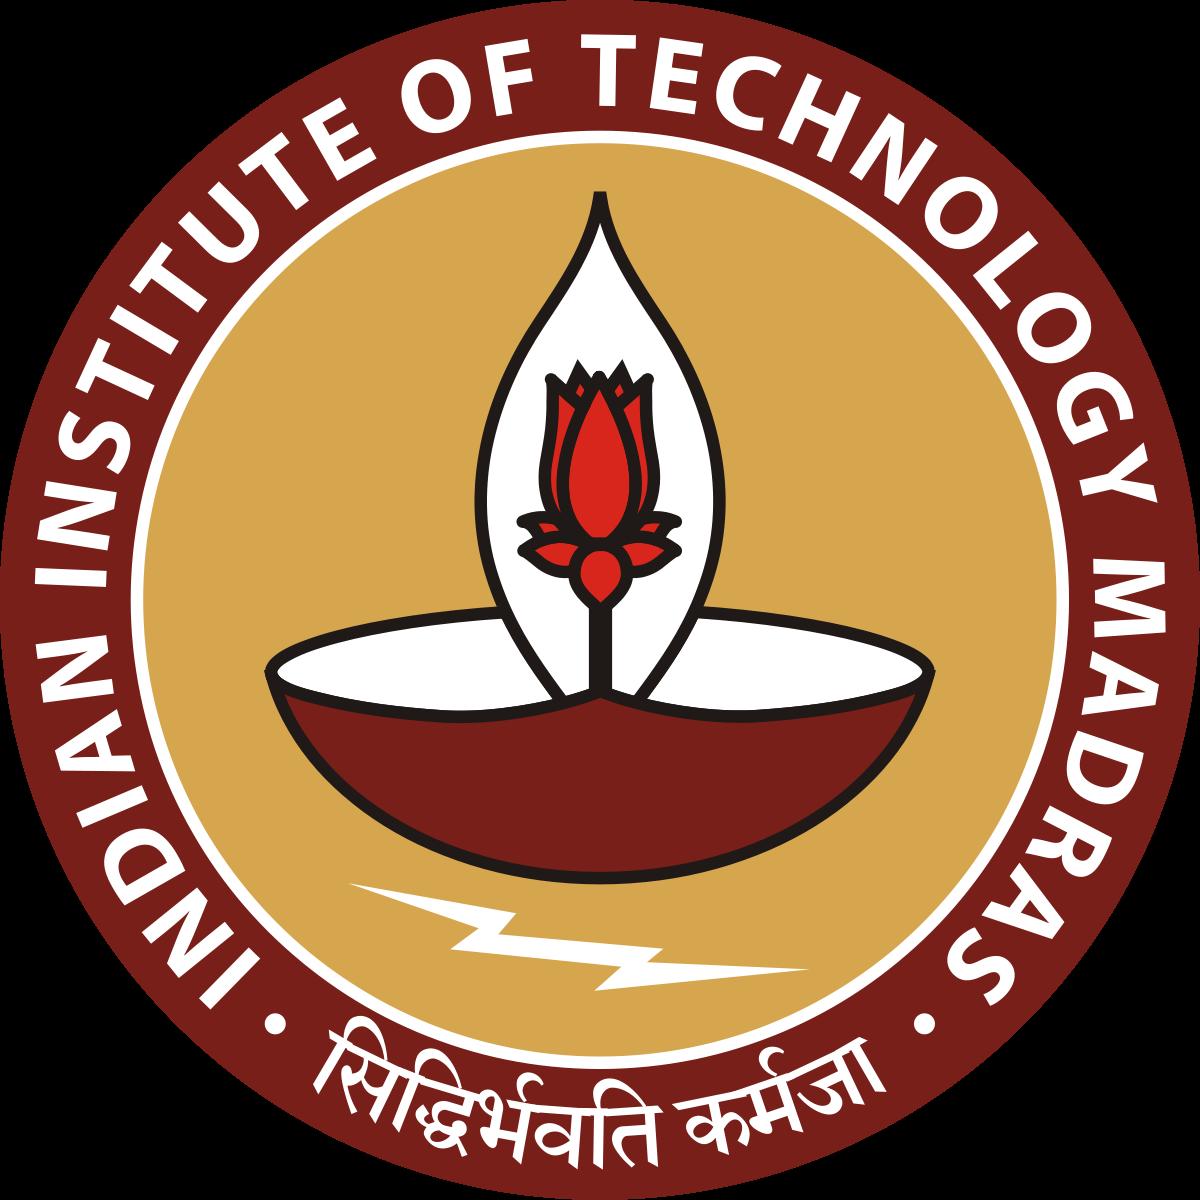 IITM Recruitment 2021 Skill Project Officer (Placement Coordinator) Jobs